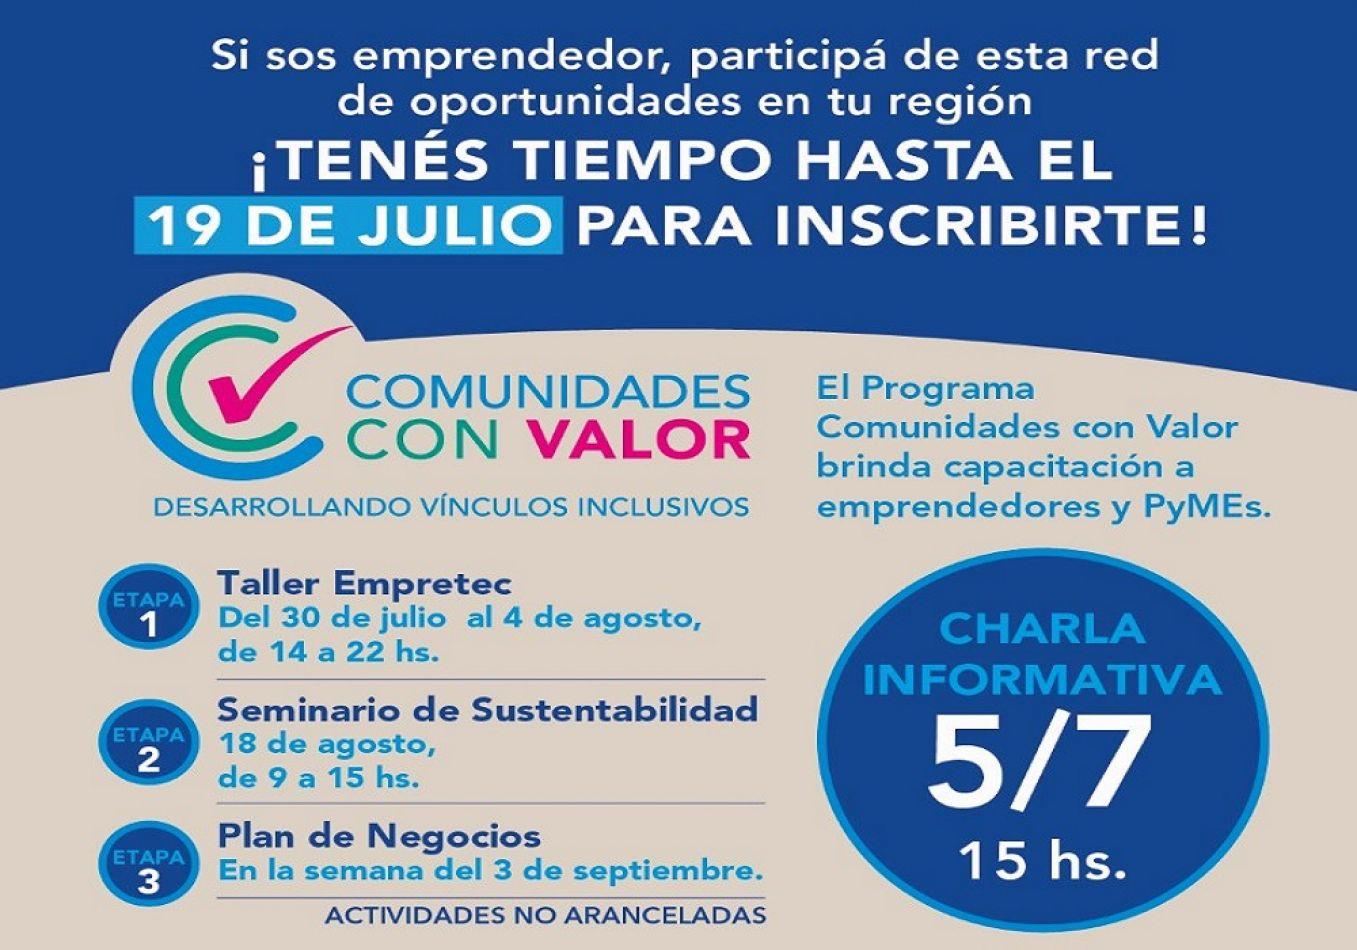 Se lanzó el programa Comunidades con Valor